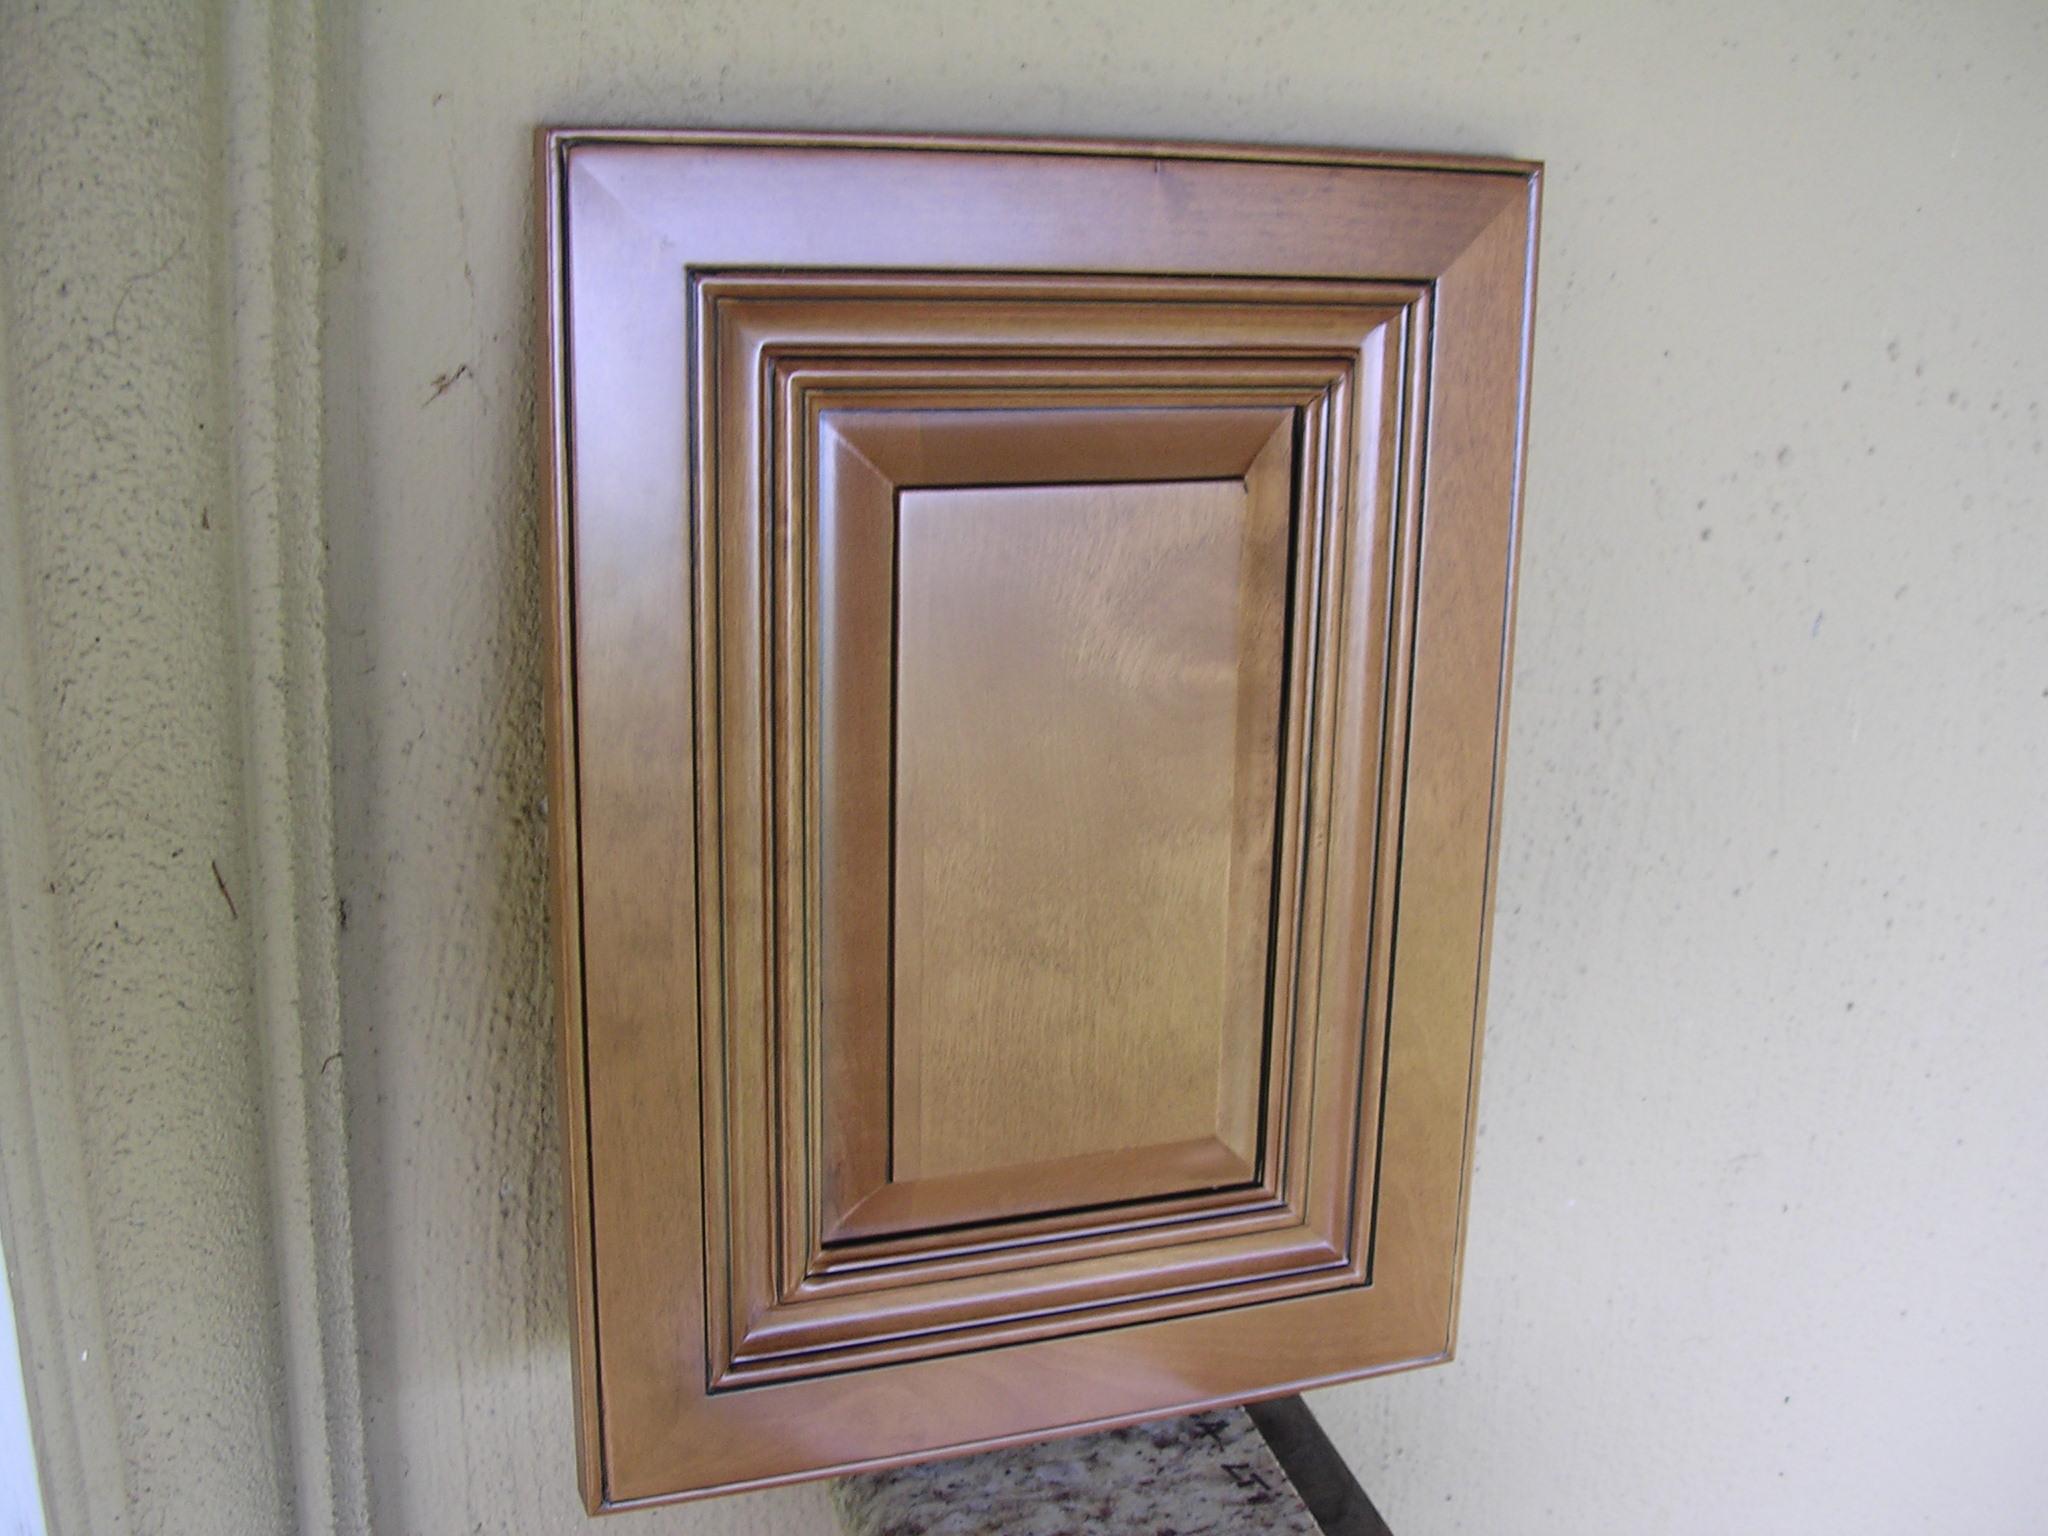 kitchen furniture interior kitchen cabinets online coffee maple rta cabinets online glaze kitchen s panel high resolution image laminate cabinets rta vanity cabinets